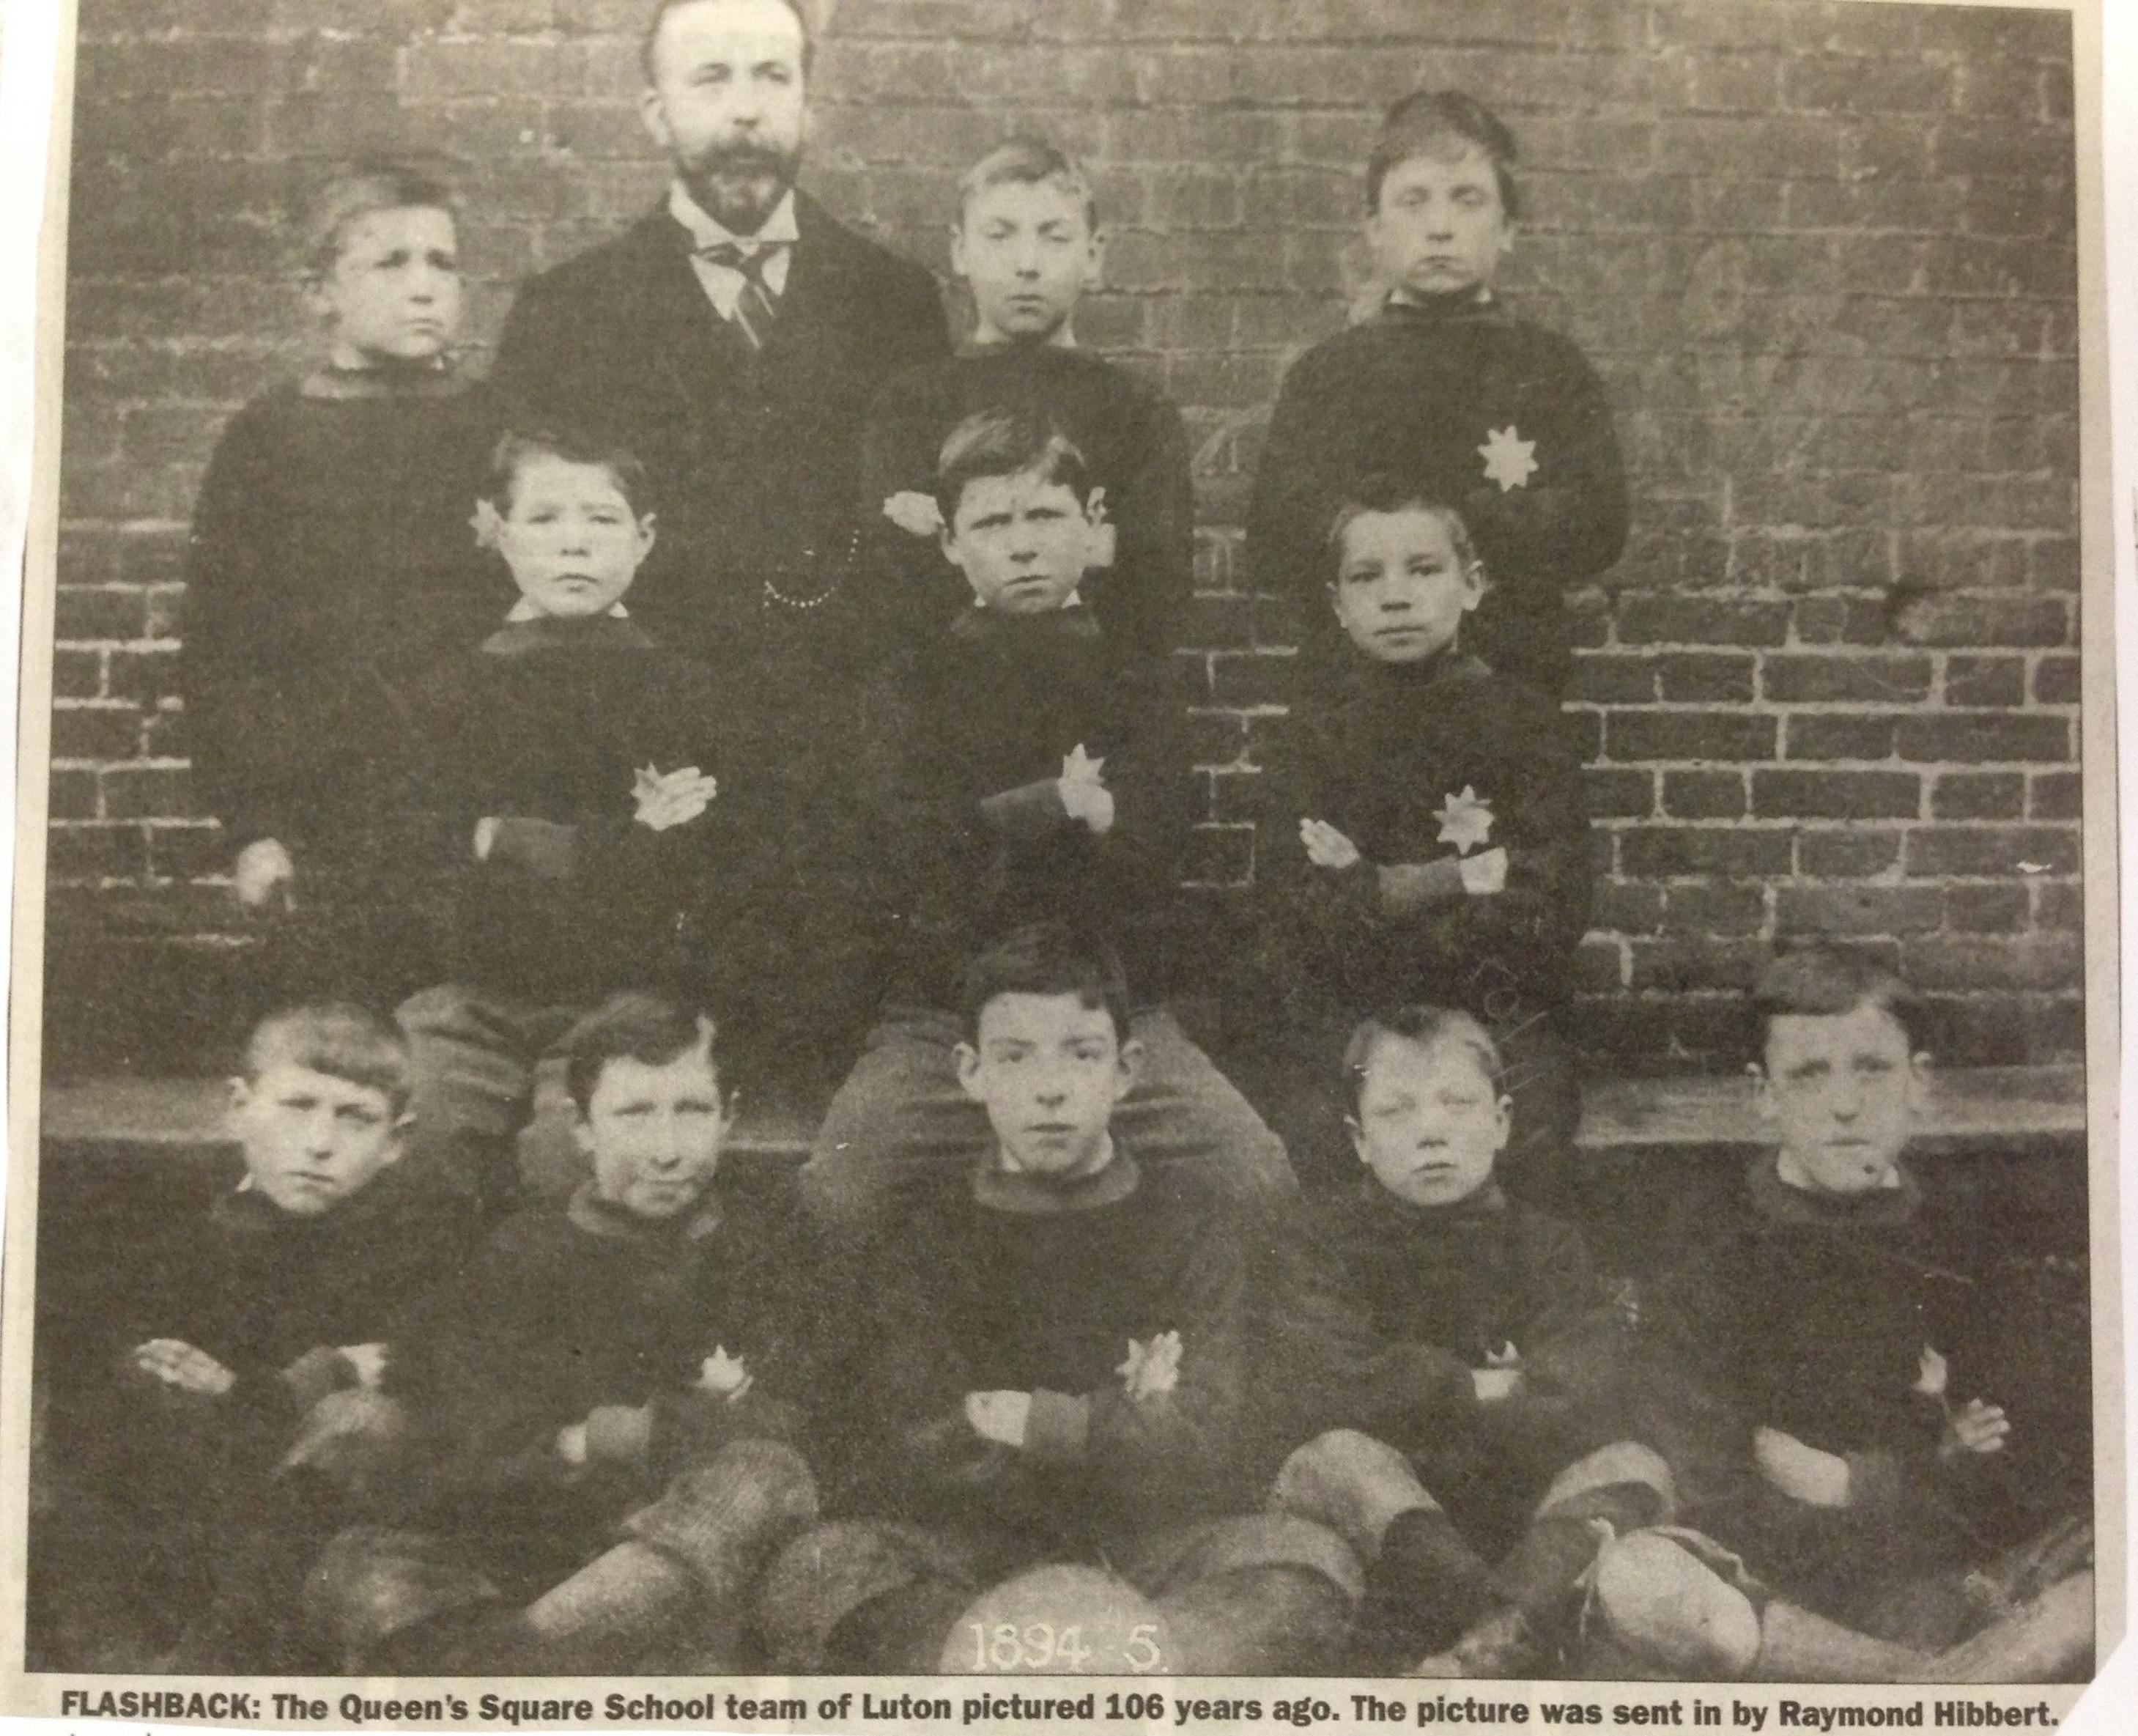 Queen's Square School, Luton 1894:95